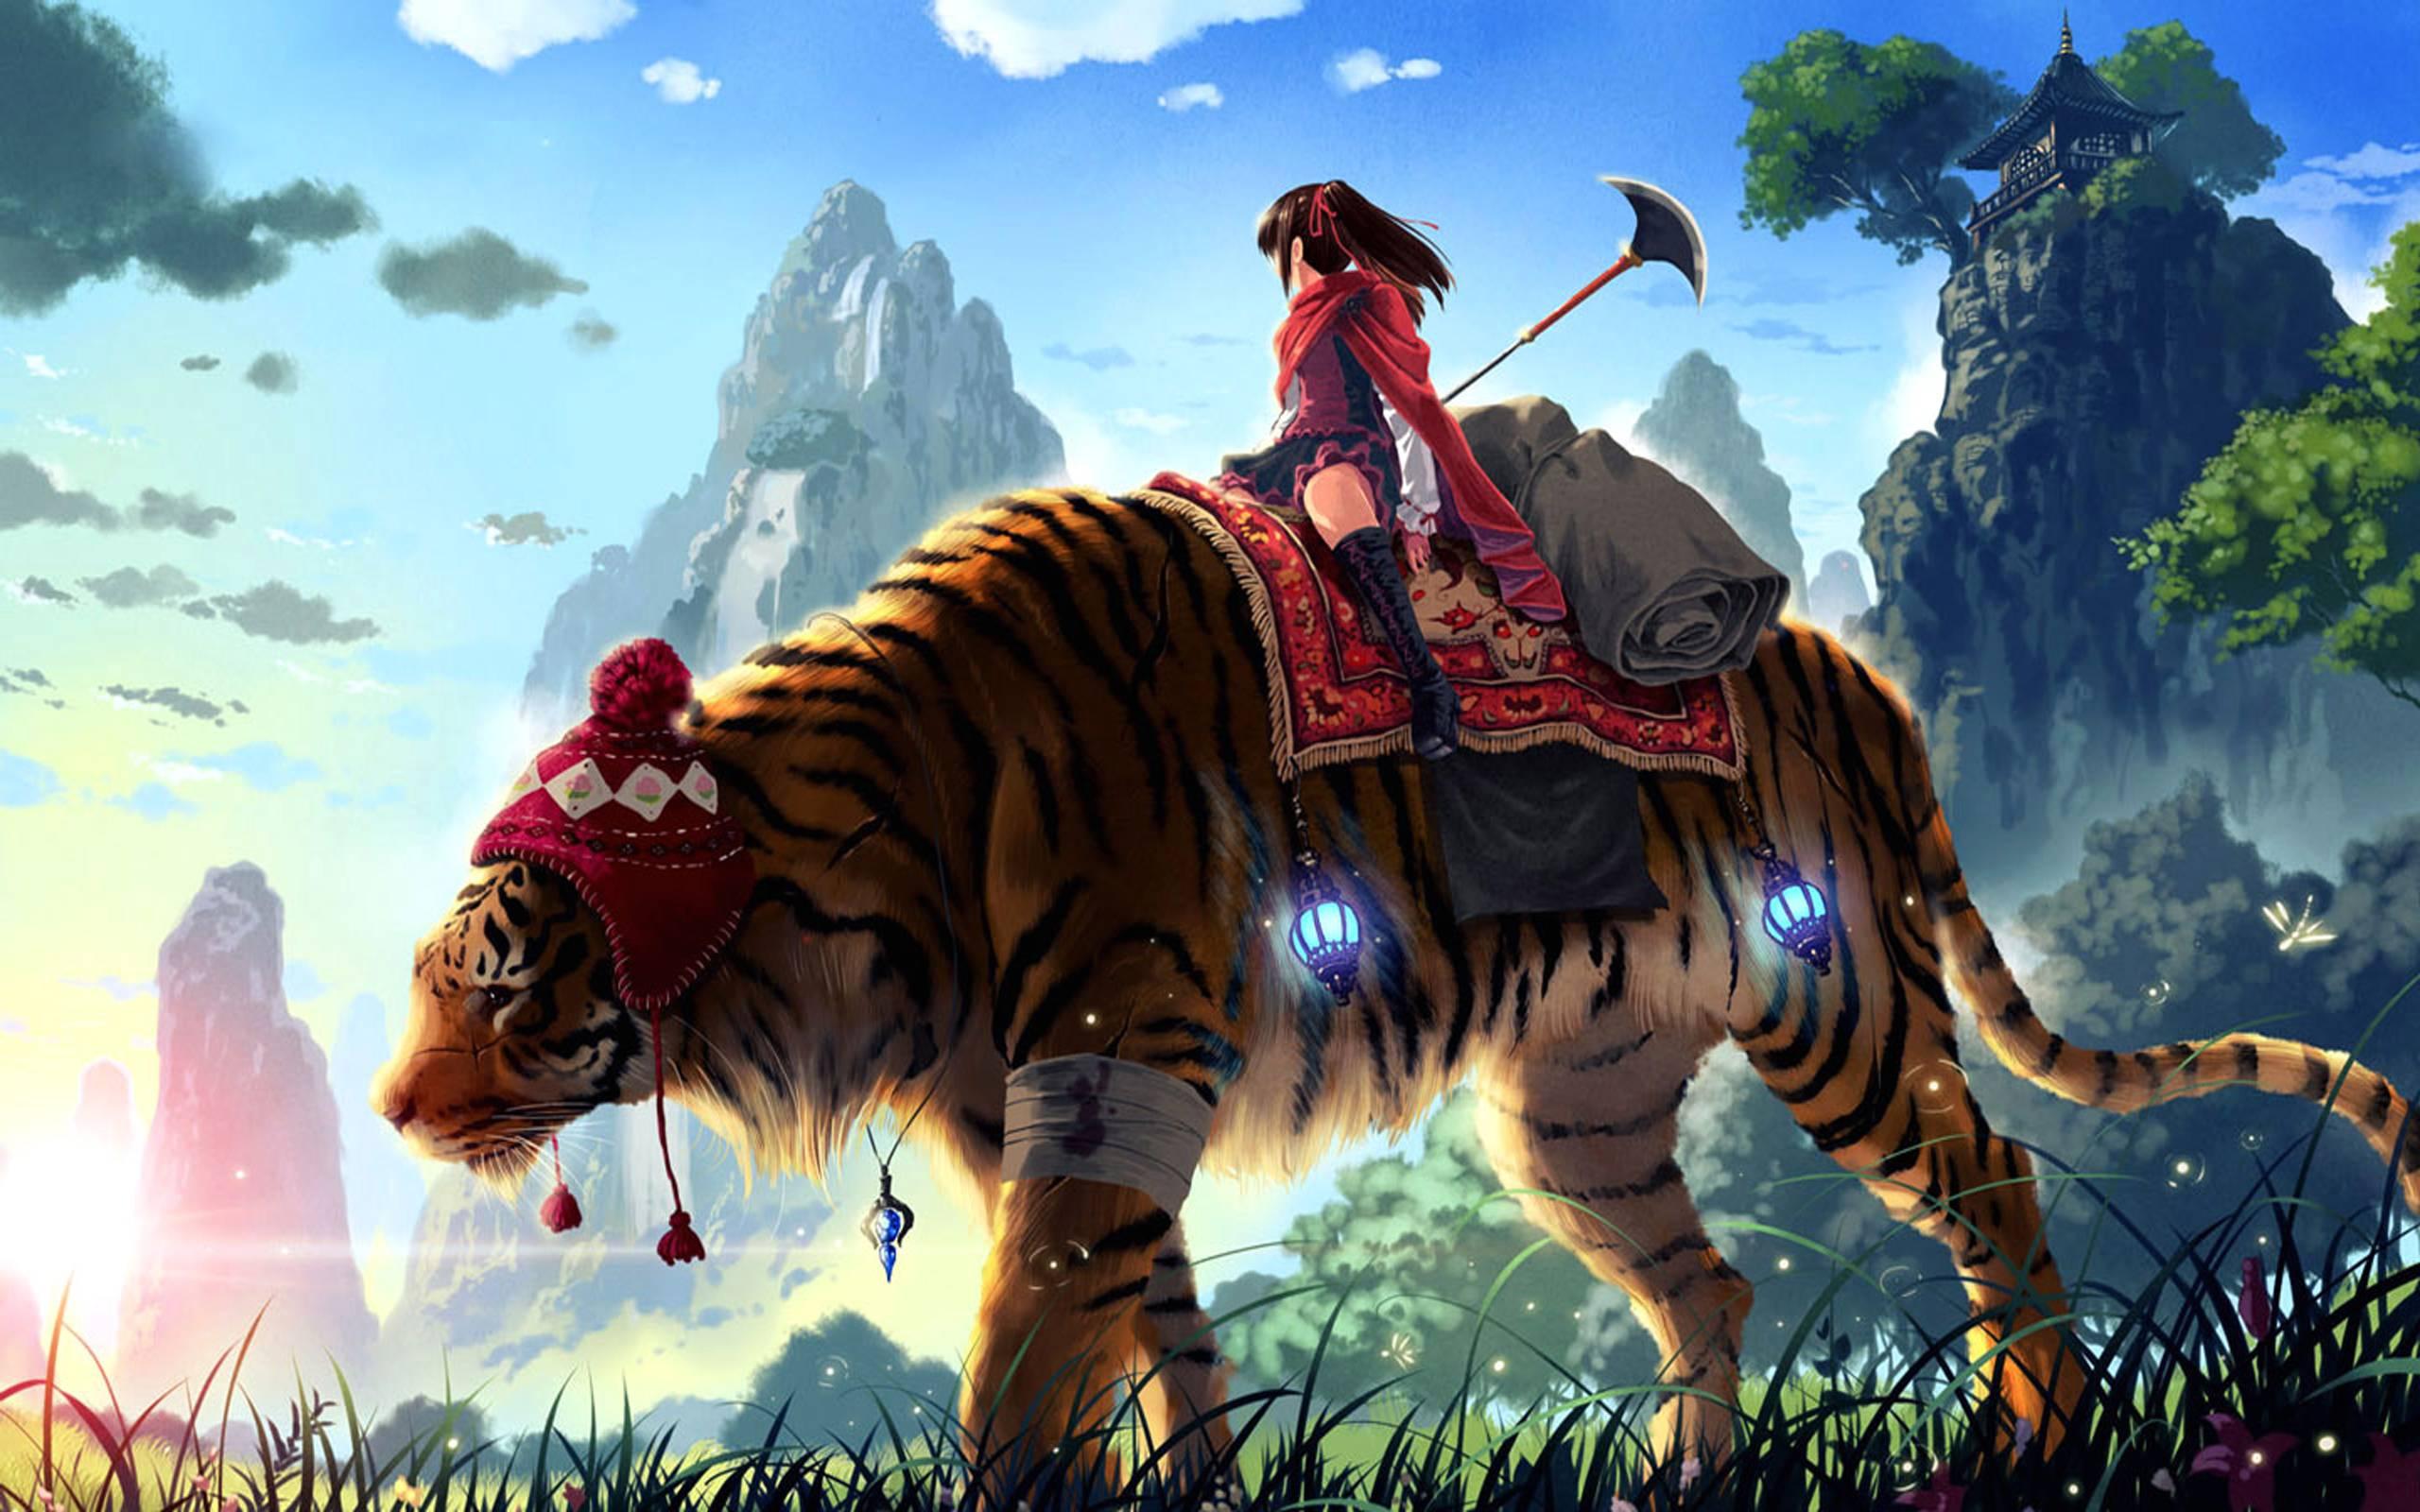 Free Anime Wallpapers Hd Download Free Anime Girl On Tiger 2560x1600 Wallpaper Teahub Io